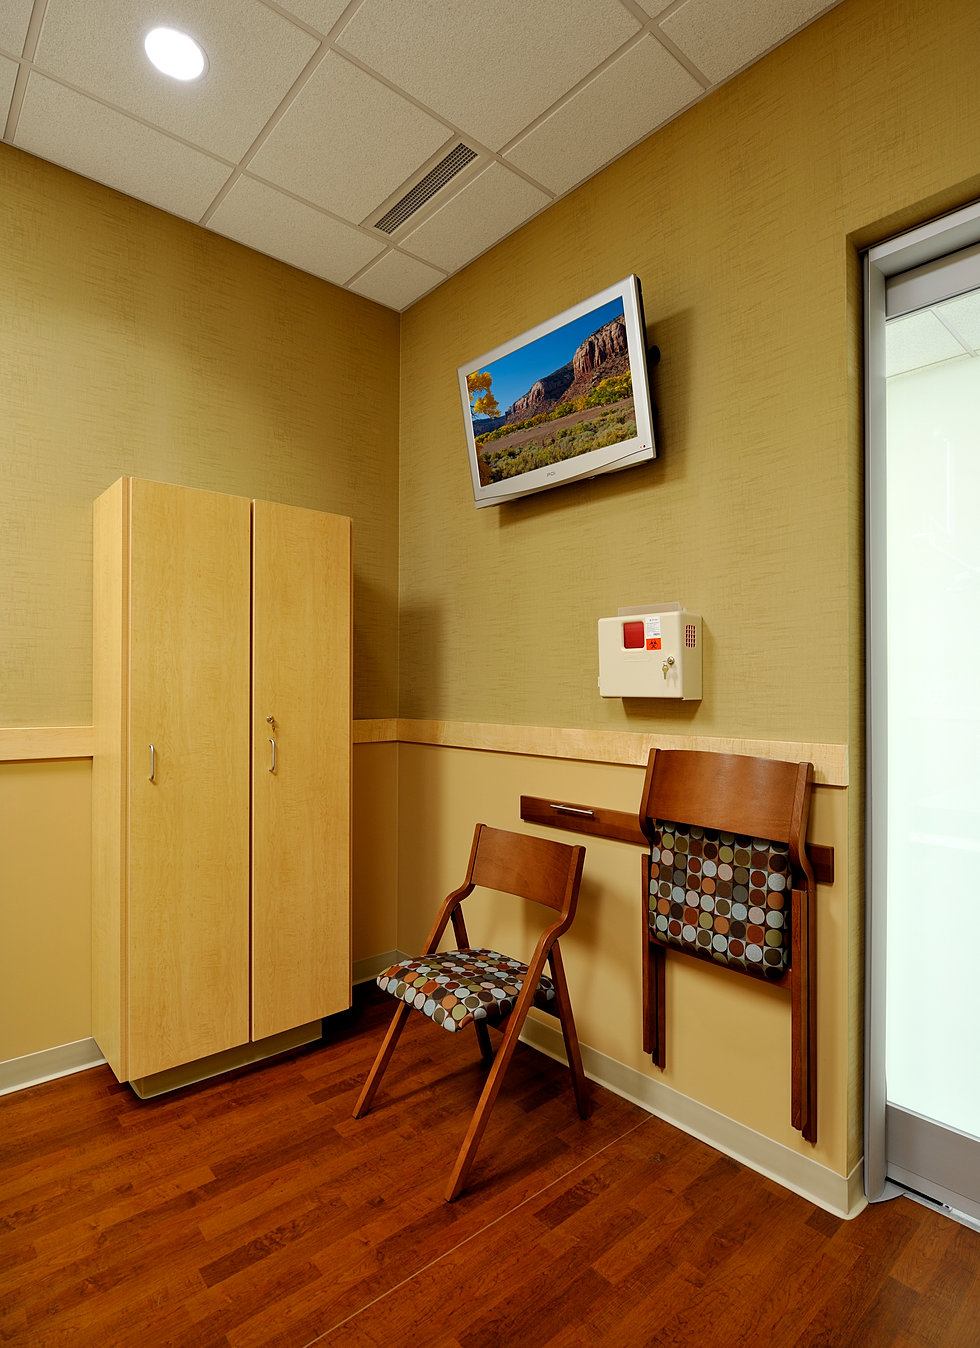 cgbach | Healthcare